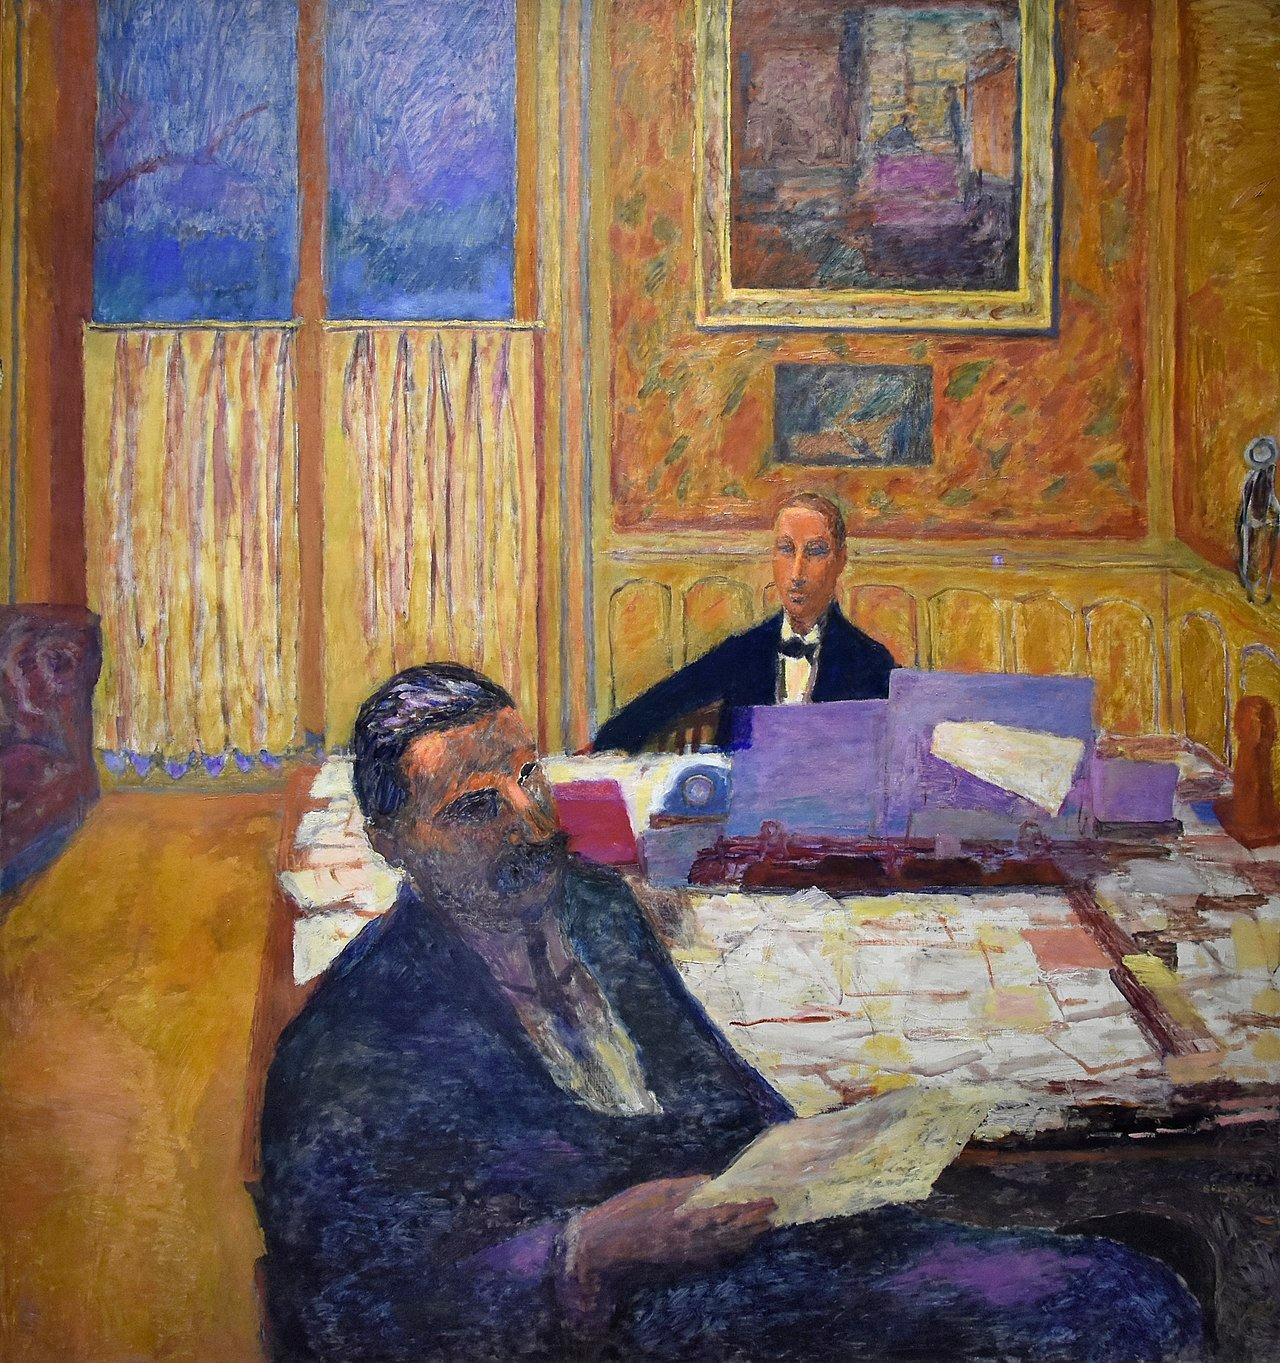 Pierre Bonnard (1867-1947), The brothers Bernheim Jeune, oil on canvas, 166 x 155 cm, Musée d'Orsay, Paris. Fonte Wikimedia Commons